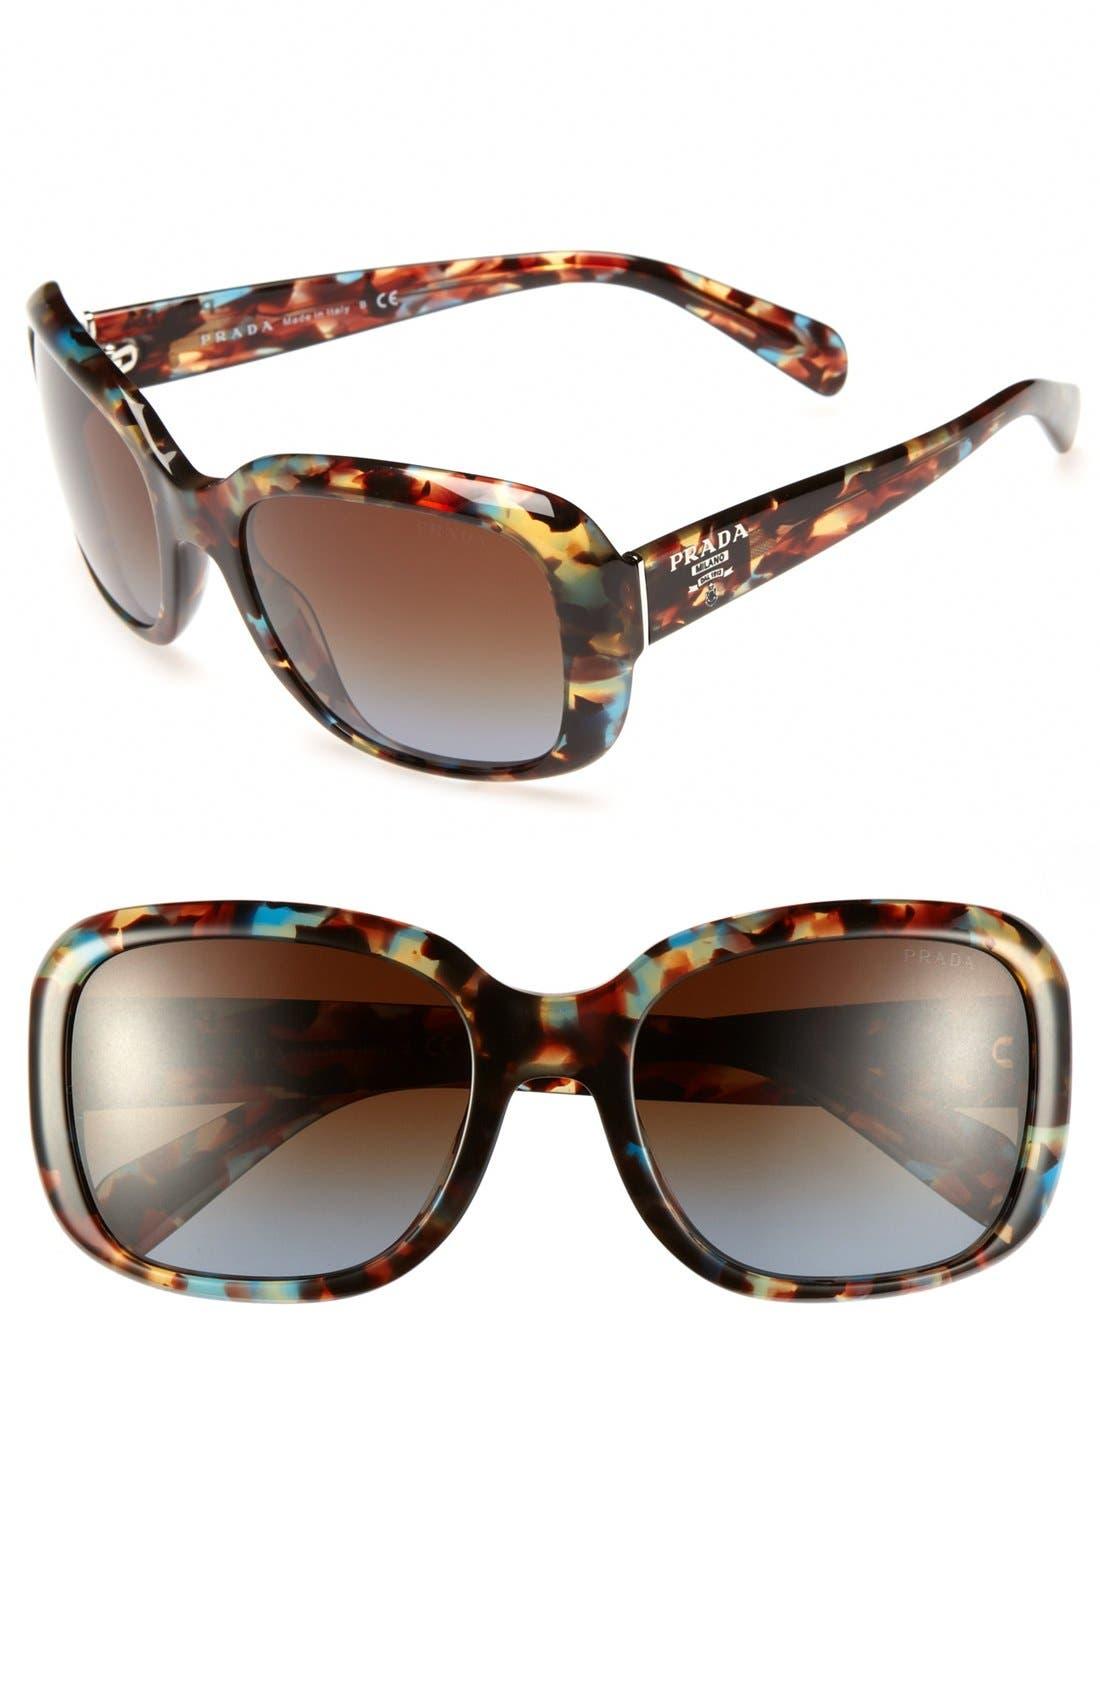 Alternate Image 1 Selected - Prada 'Oversized Glam' 57mm Sunglasses